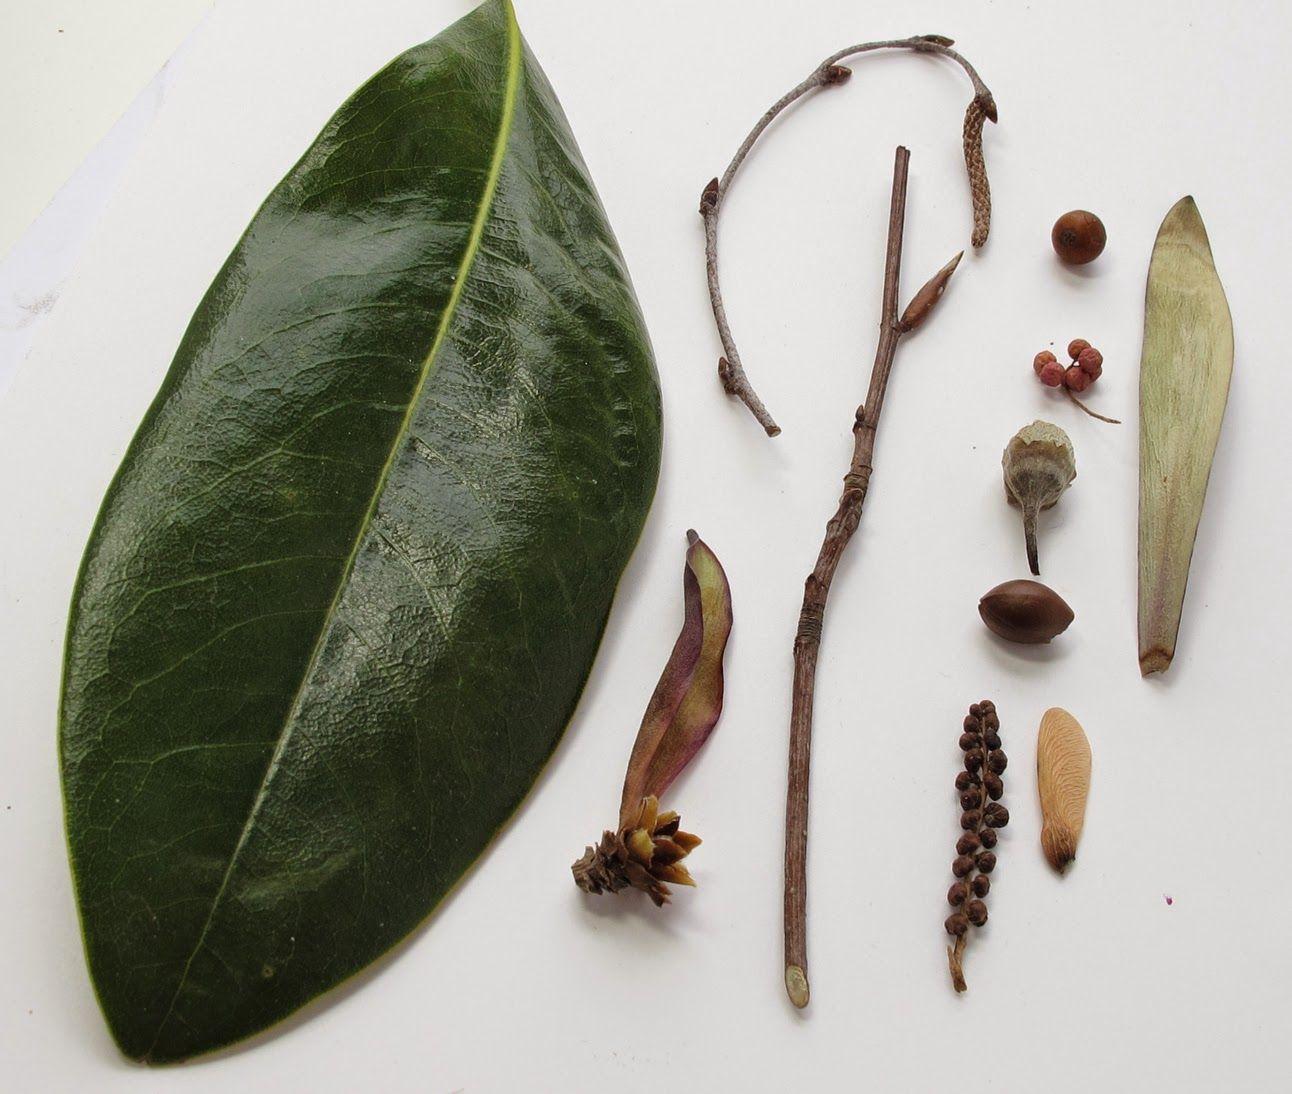 studio jeweler 'Arm Candy' Botanical Jewelry at The